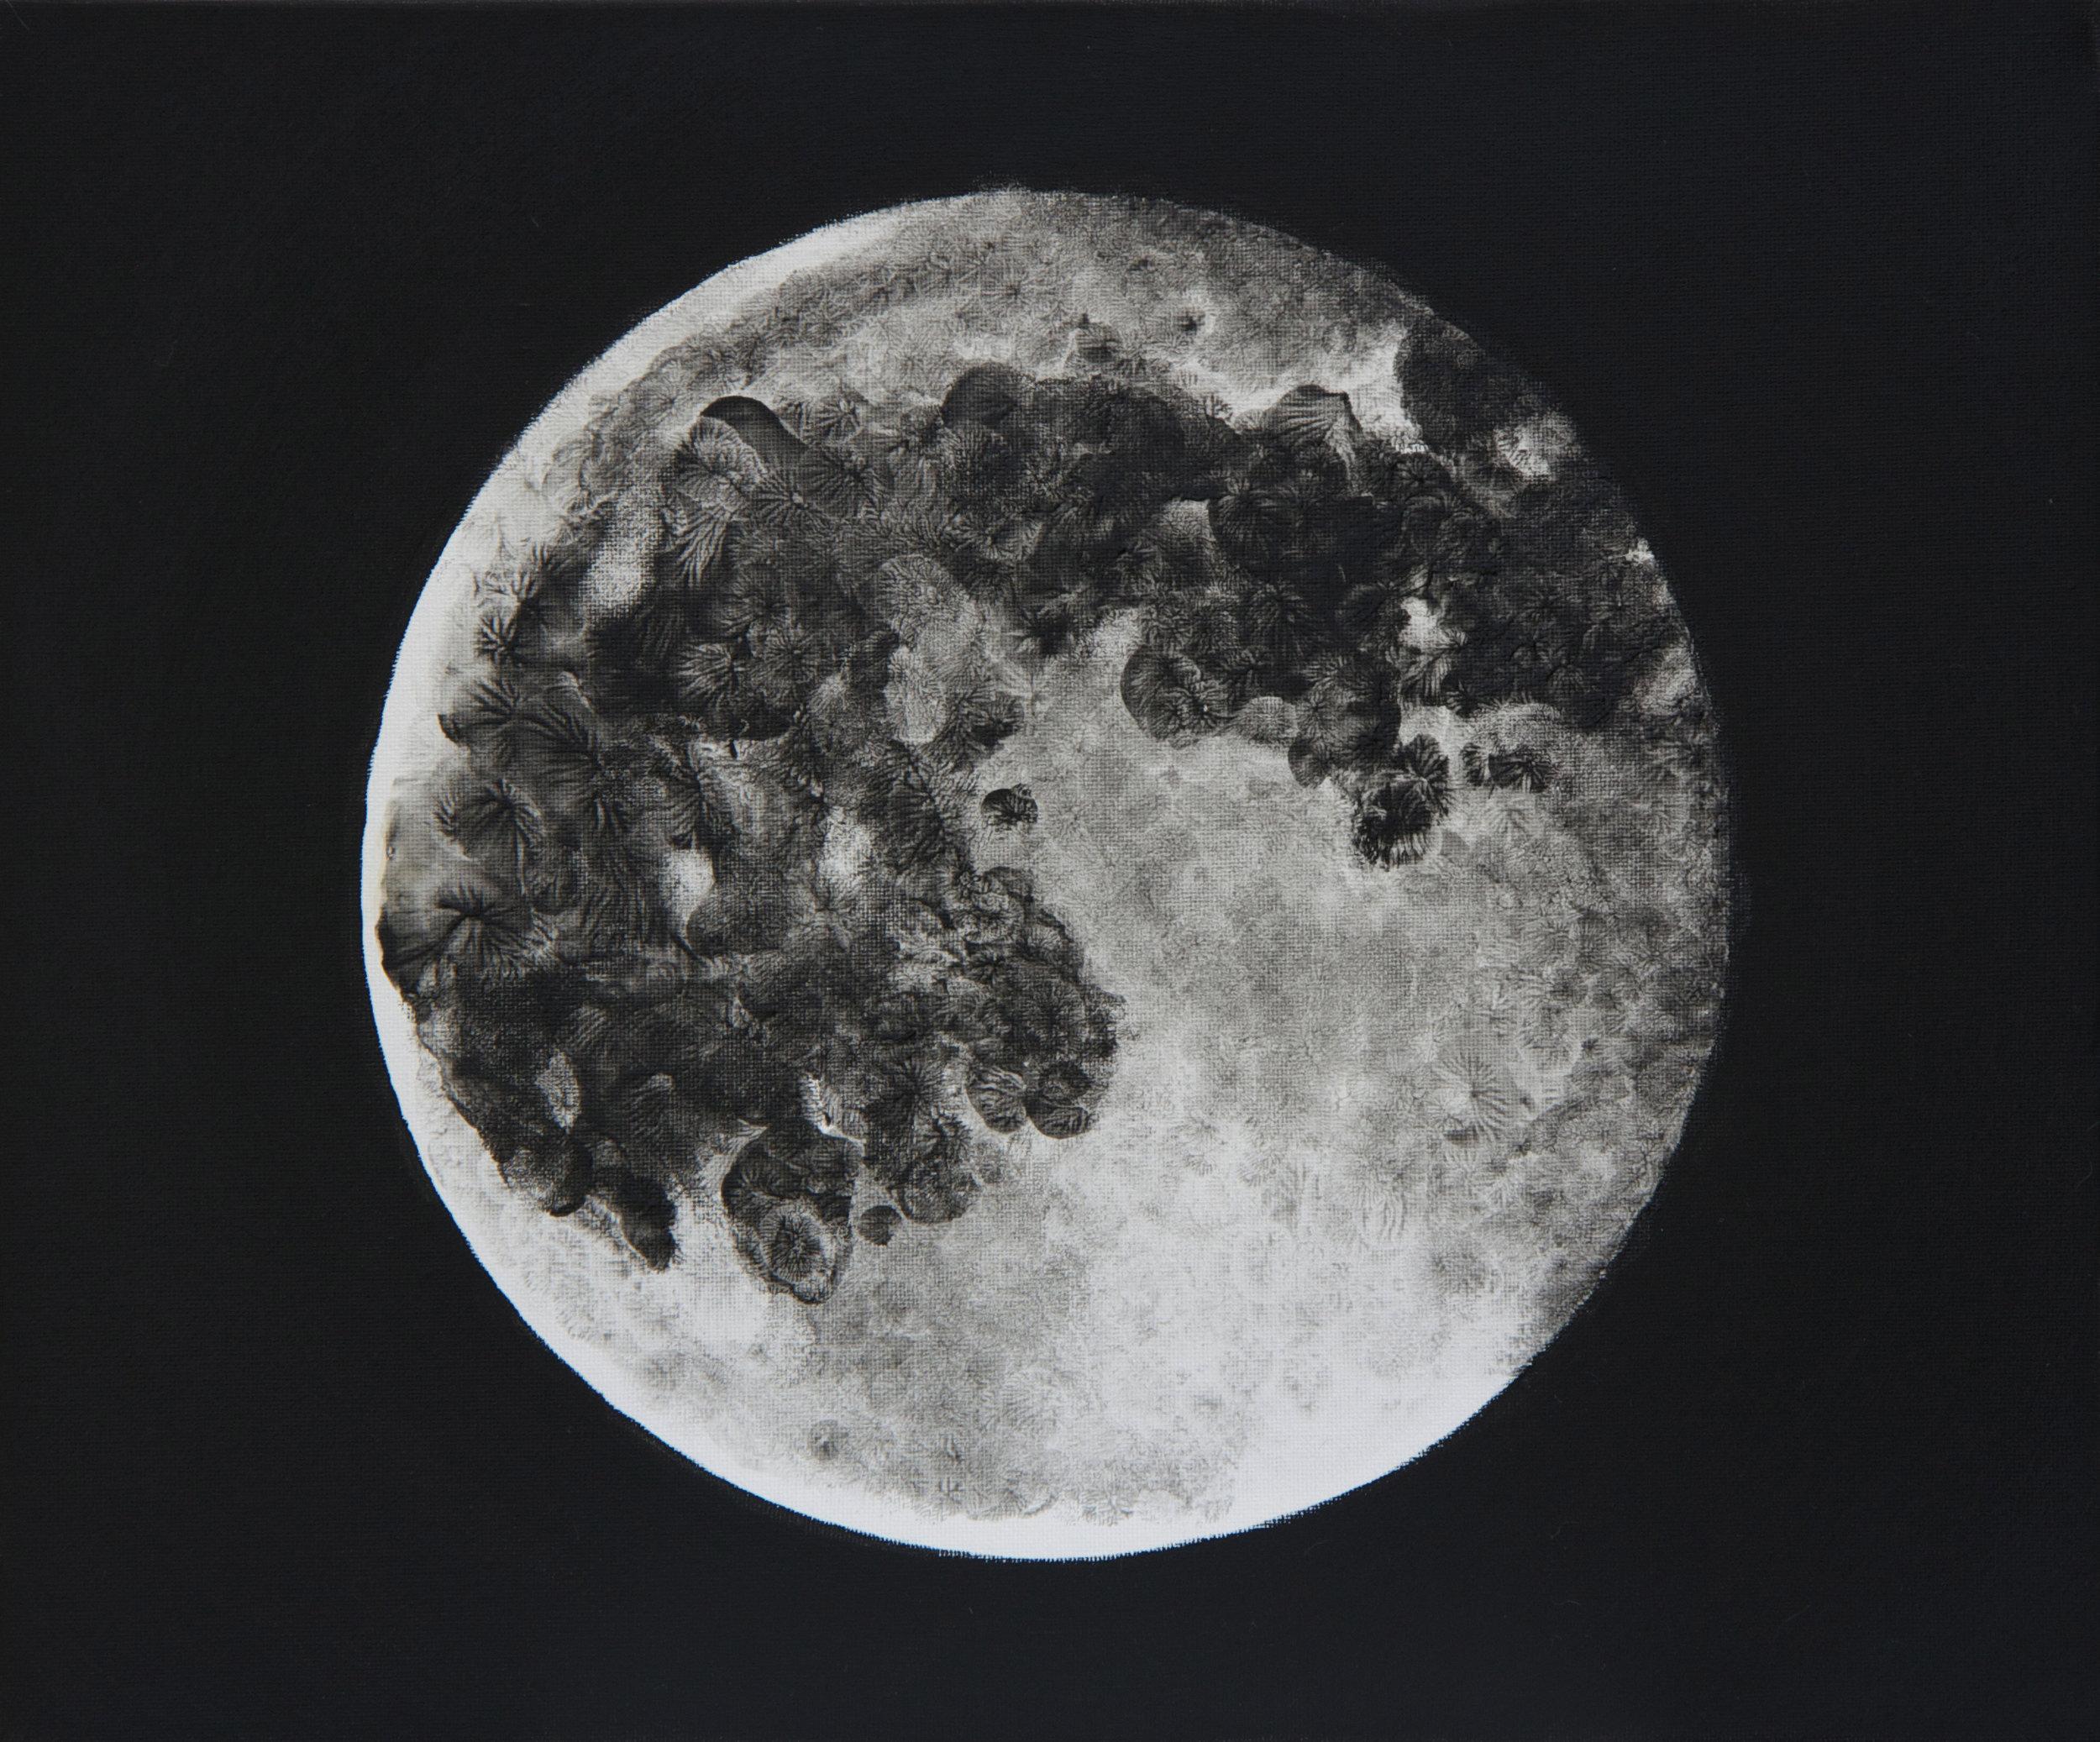 Touching the Moon III,  oil on canvas, fingerprints,  30x25  cm, 2015